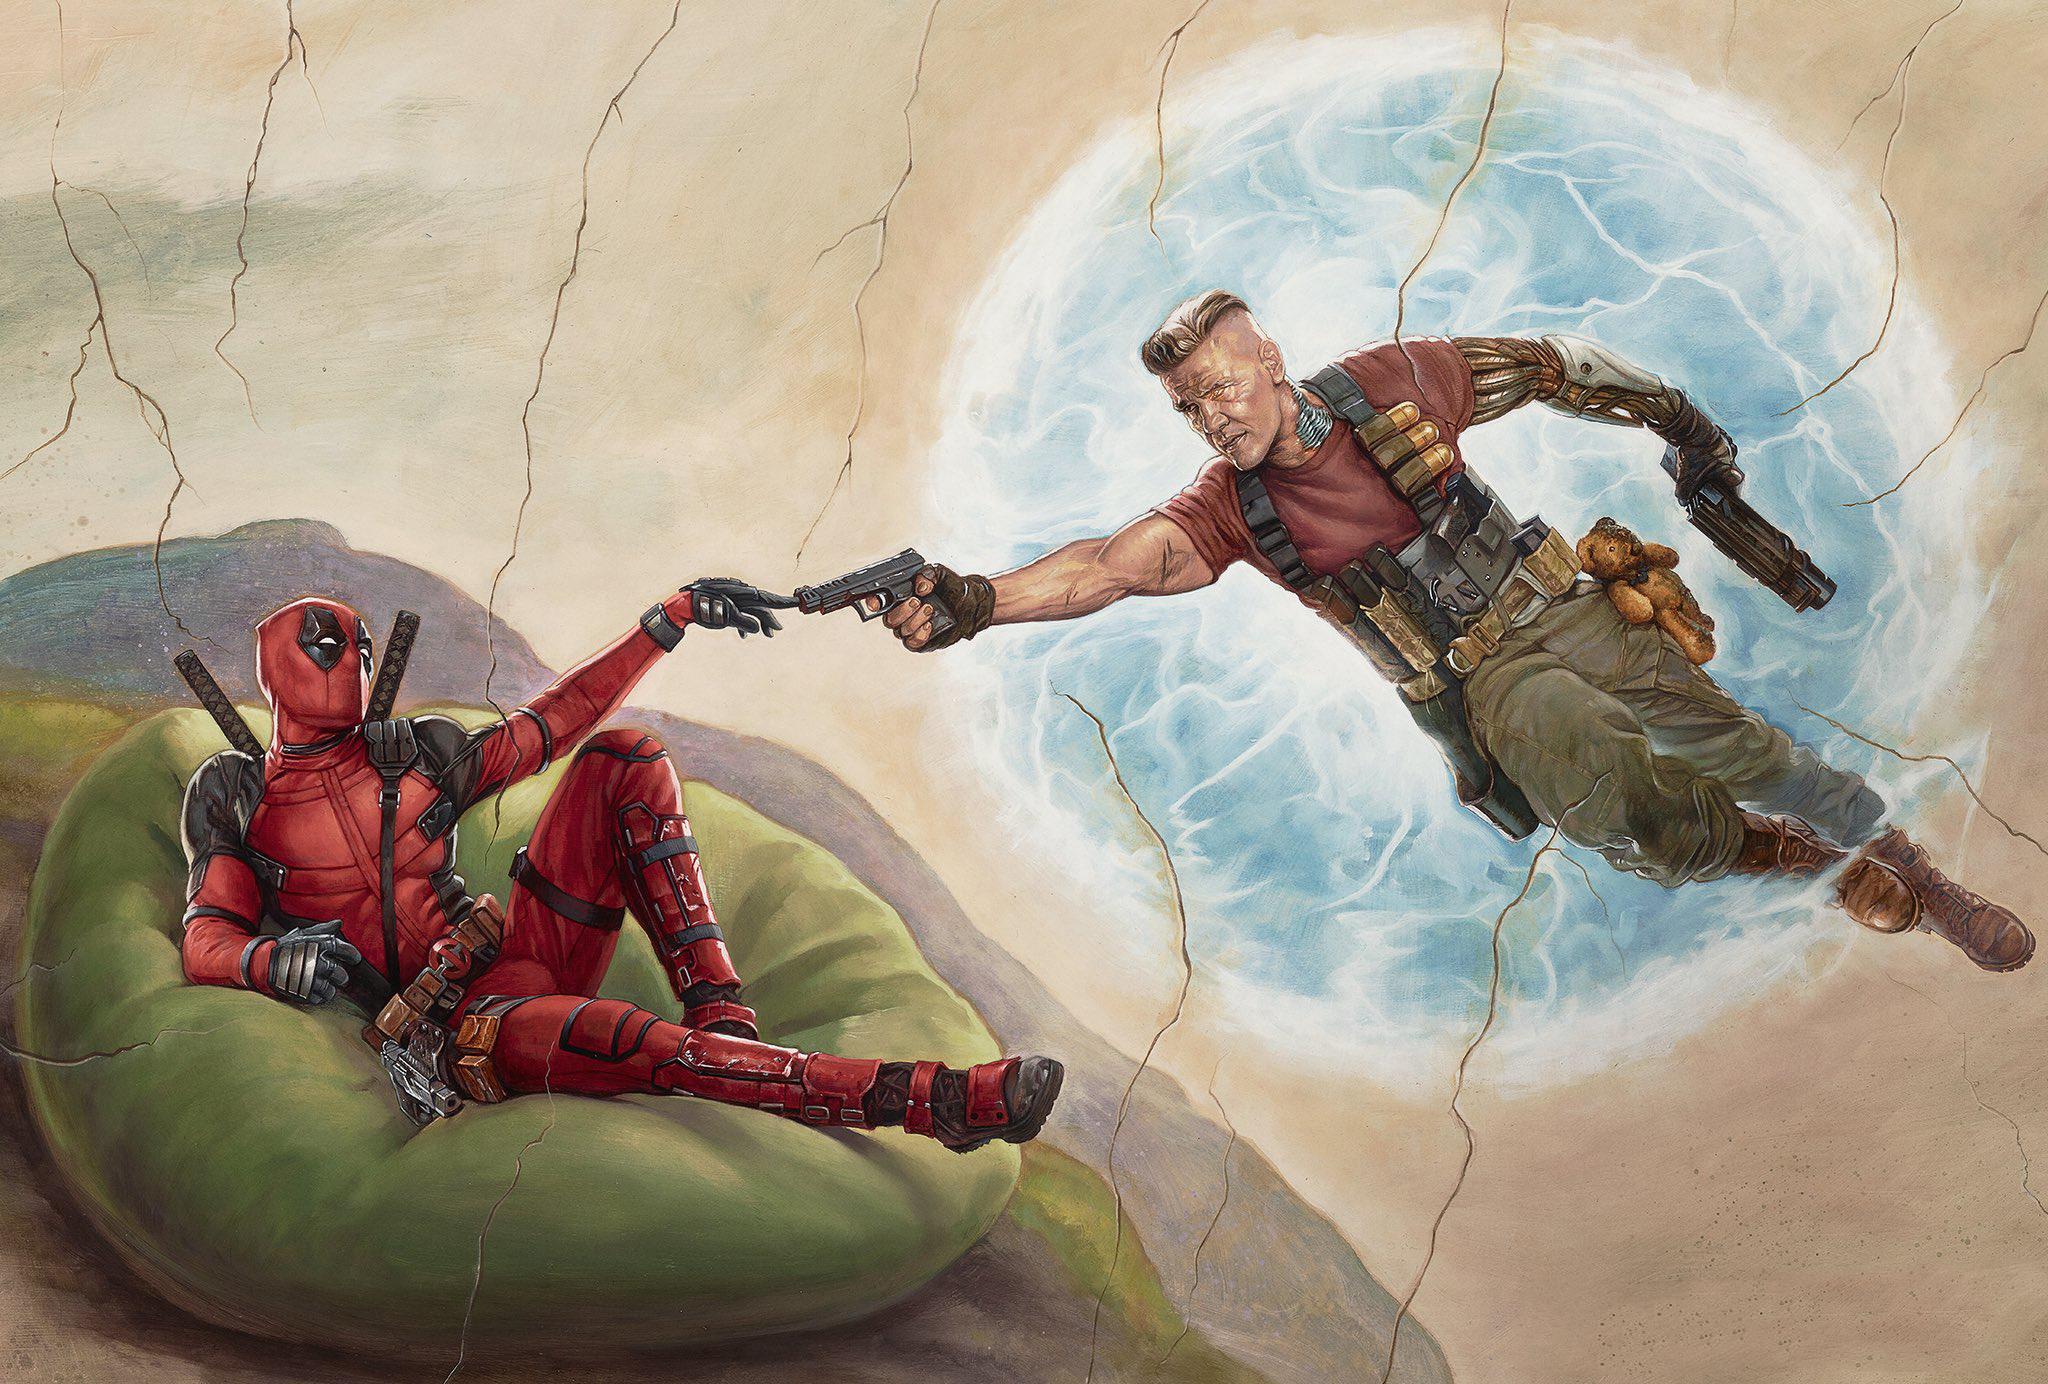 Popular Wallpaper Marvel Cable - Deadpool-Deadpool-2-Ryan-Reynolds-Josh-Brolin-Cable-Marvel-Cinematic-Universe-artwork-movies-gun-1299375  Gallery_67725.jpg